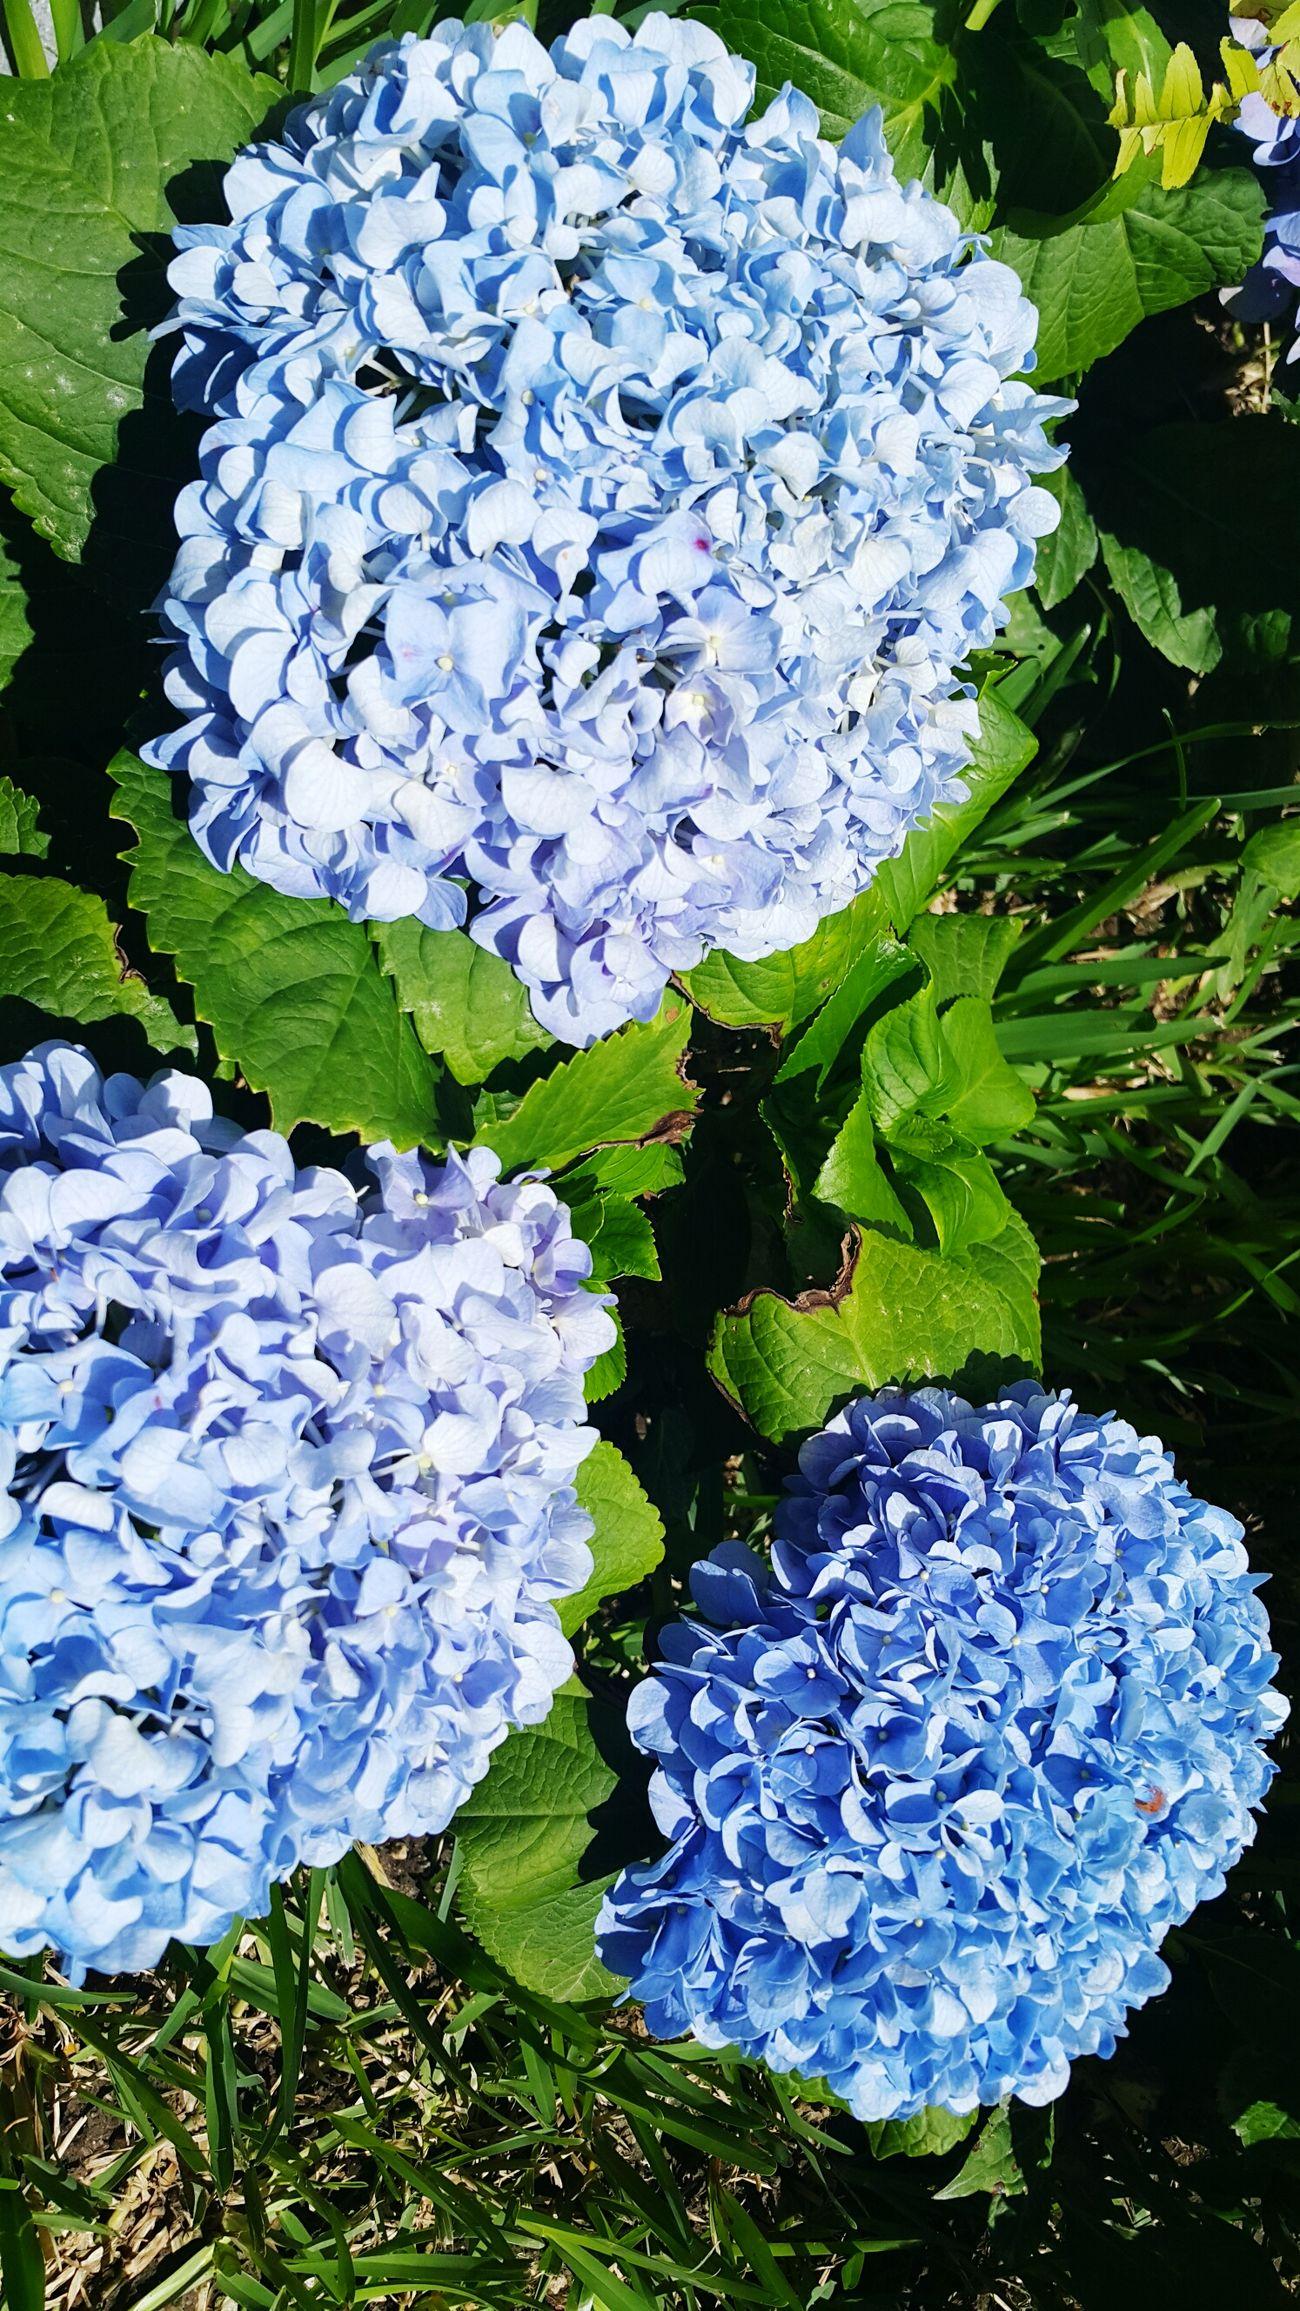 Hortensia Flower Nature Plant Flower Flower Head Day Purple Flower Blue Flowers